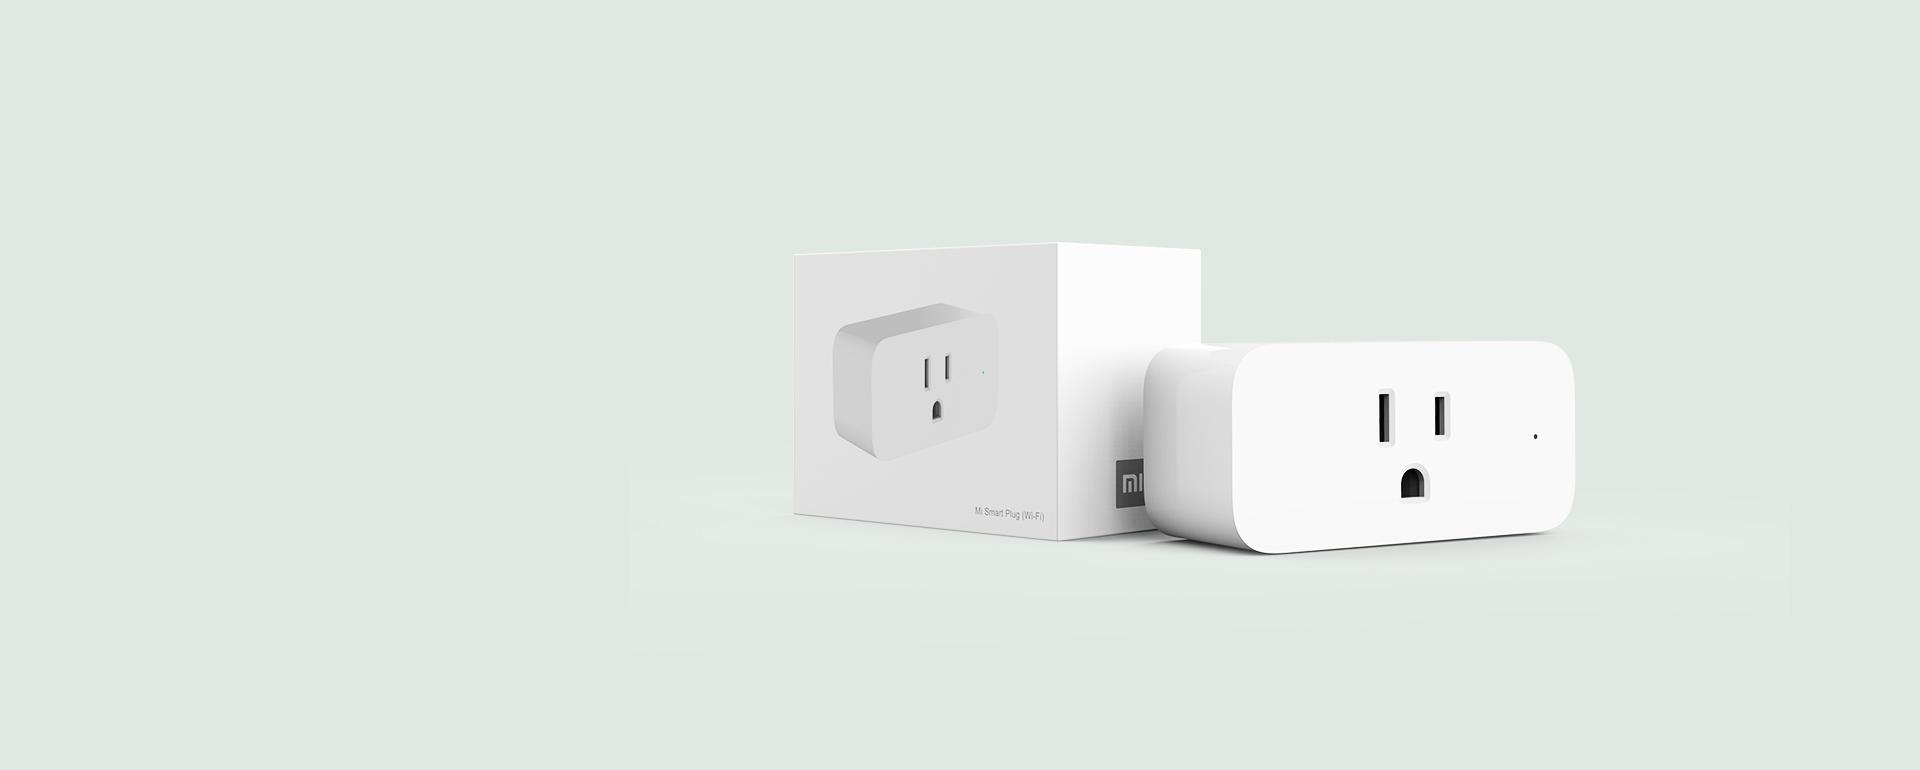 Xiaomi United States Analog Timers Gururaj Products Mi Smart Plug